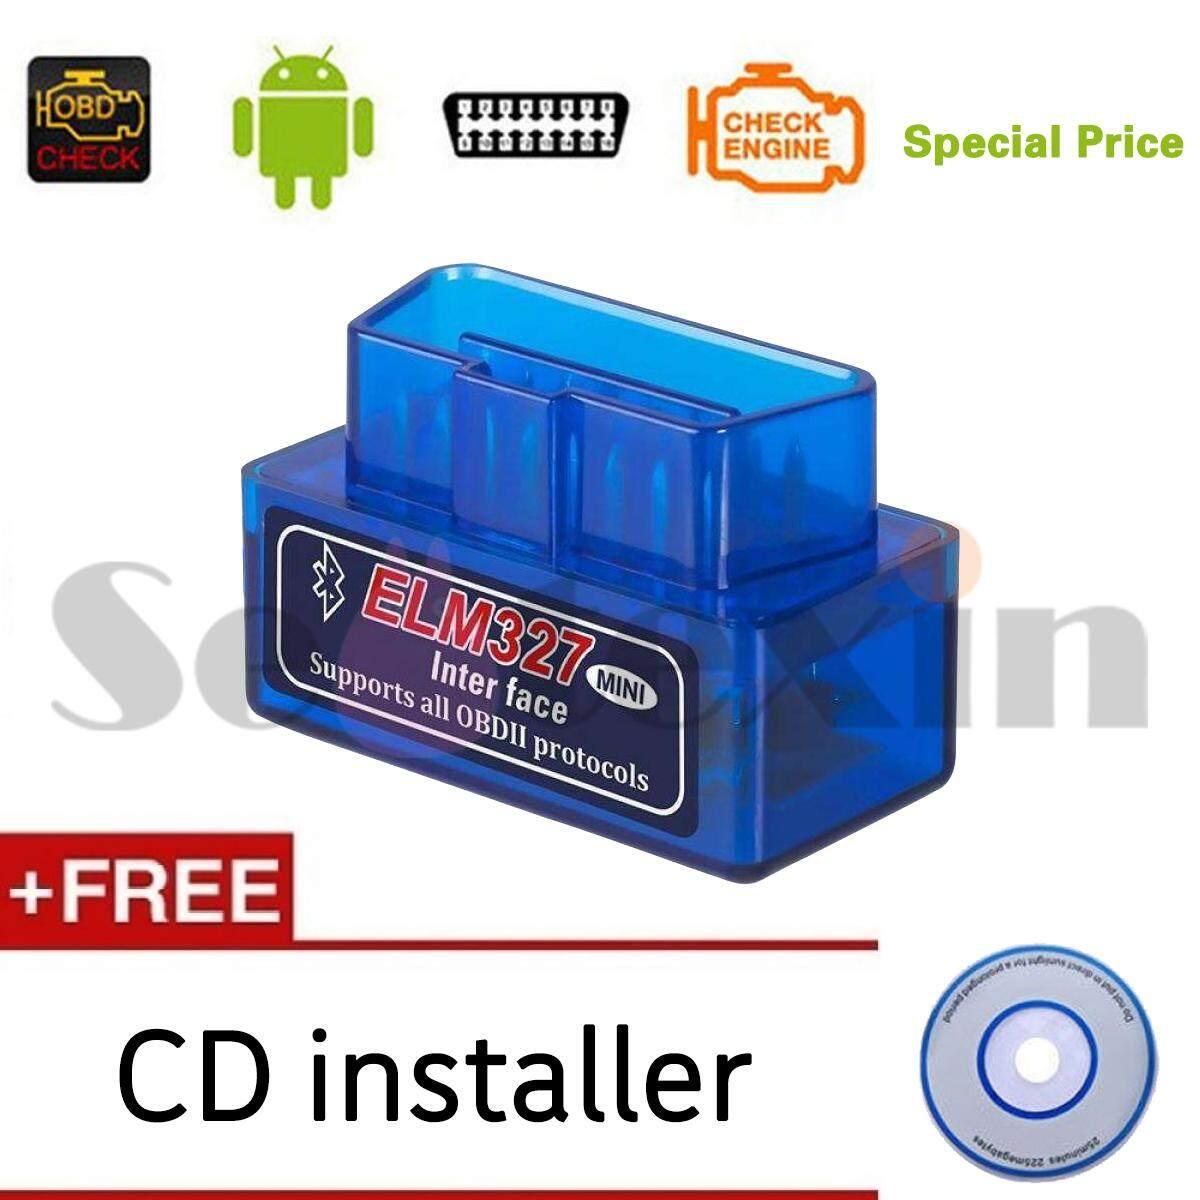 OBD2 Mini ELM327 Bluetooth V2.1 Wireless Car Diagnostic Scanner Universal OBD II Auto Scan